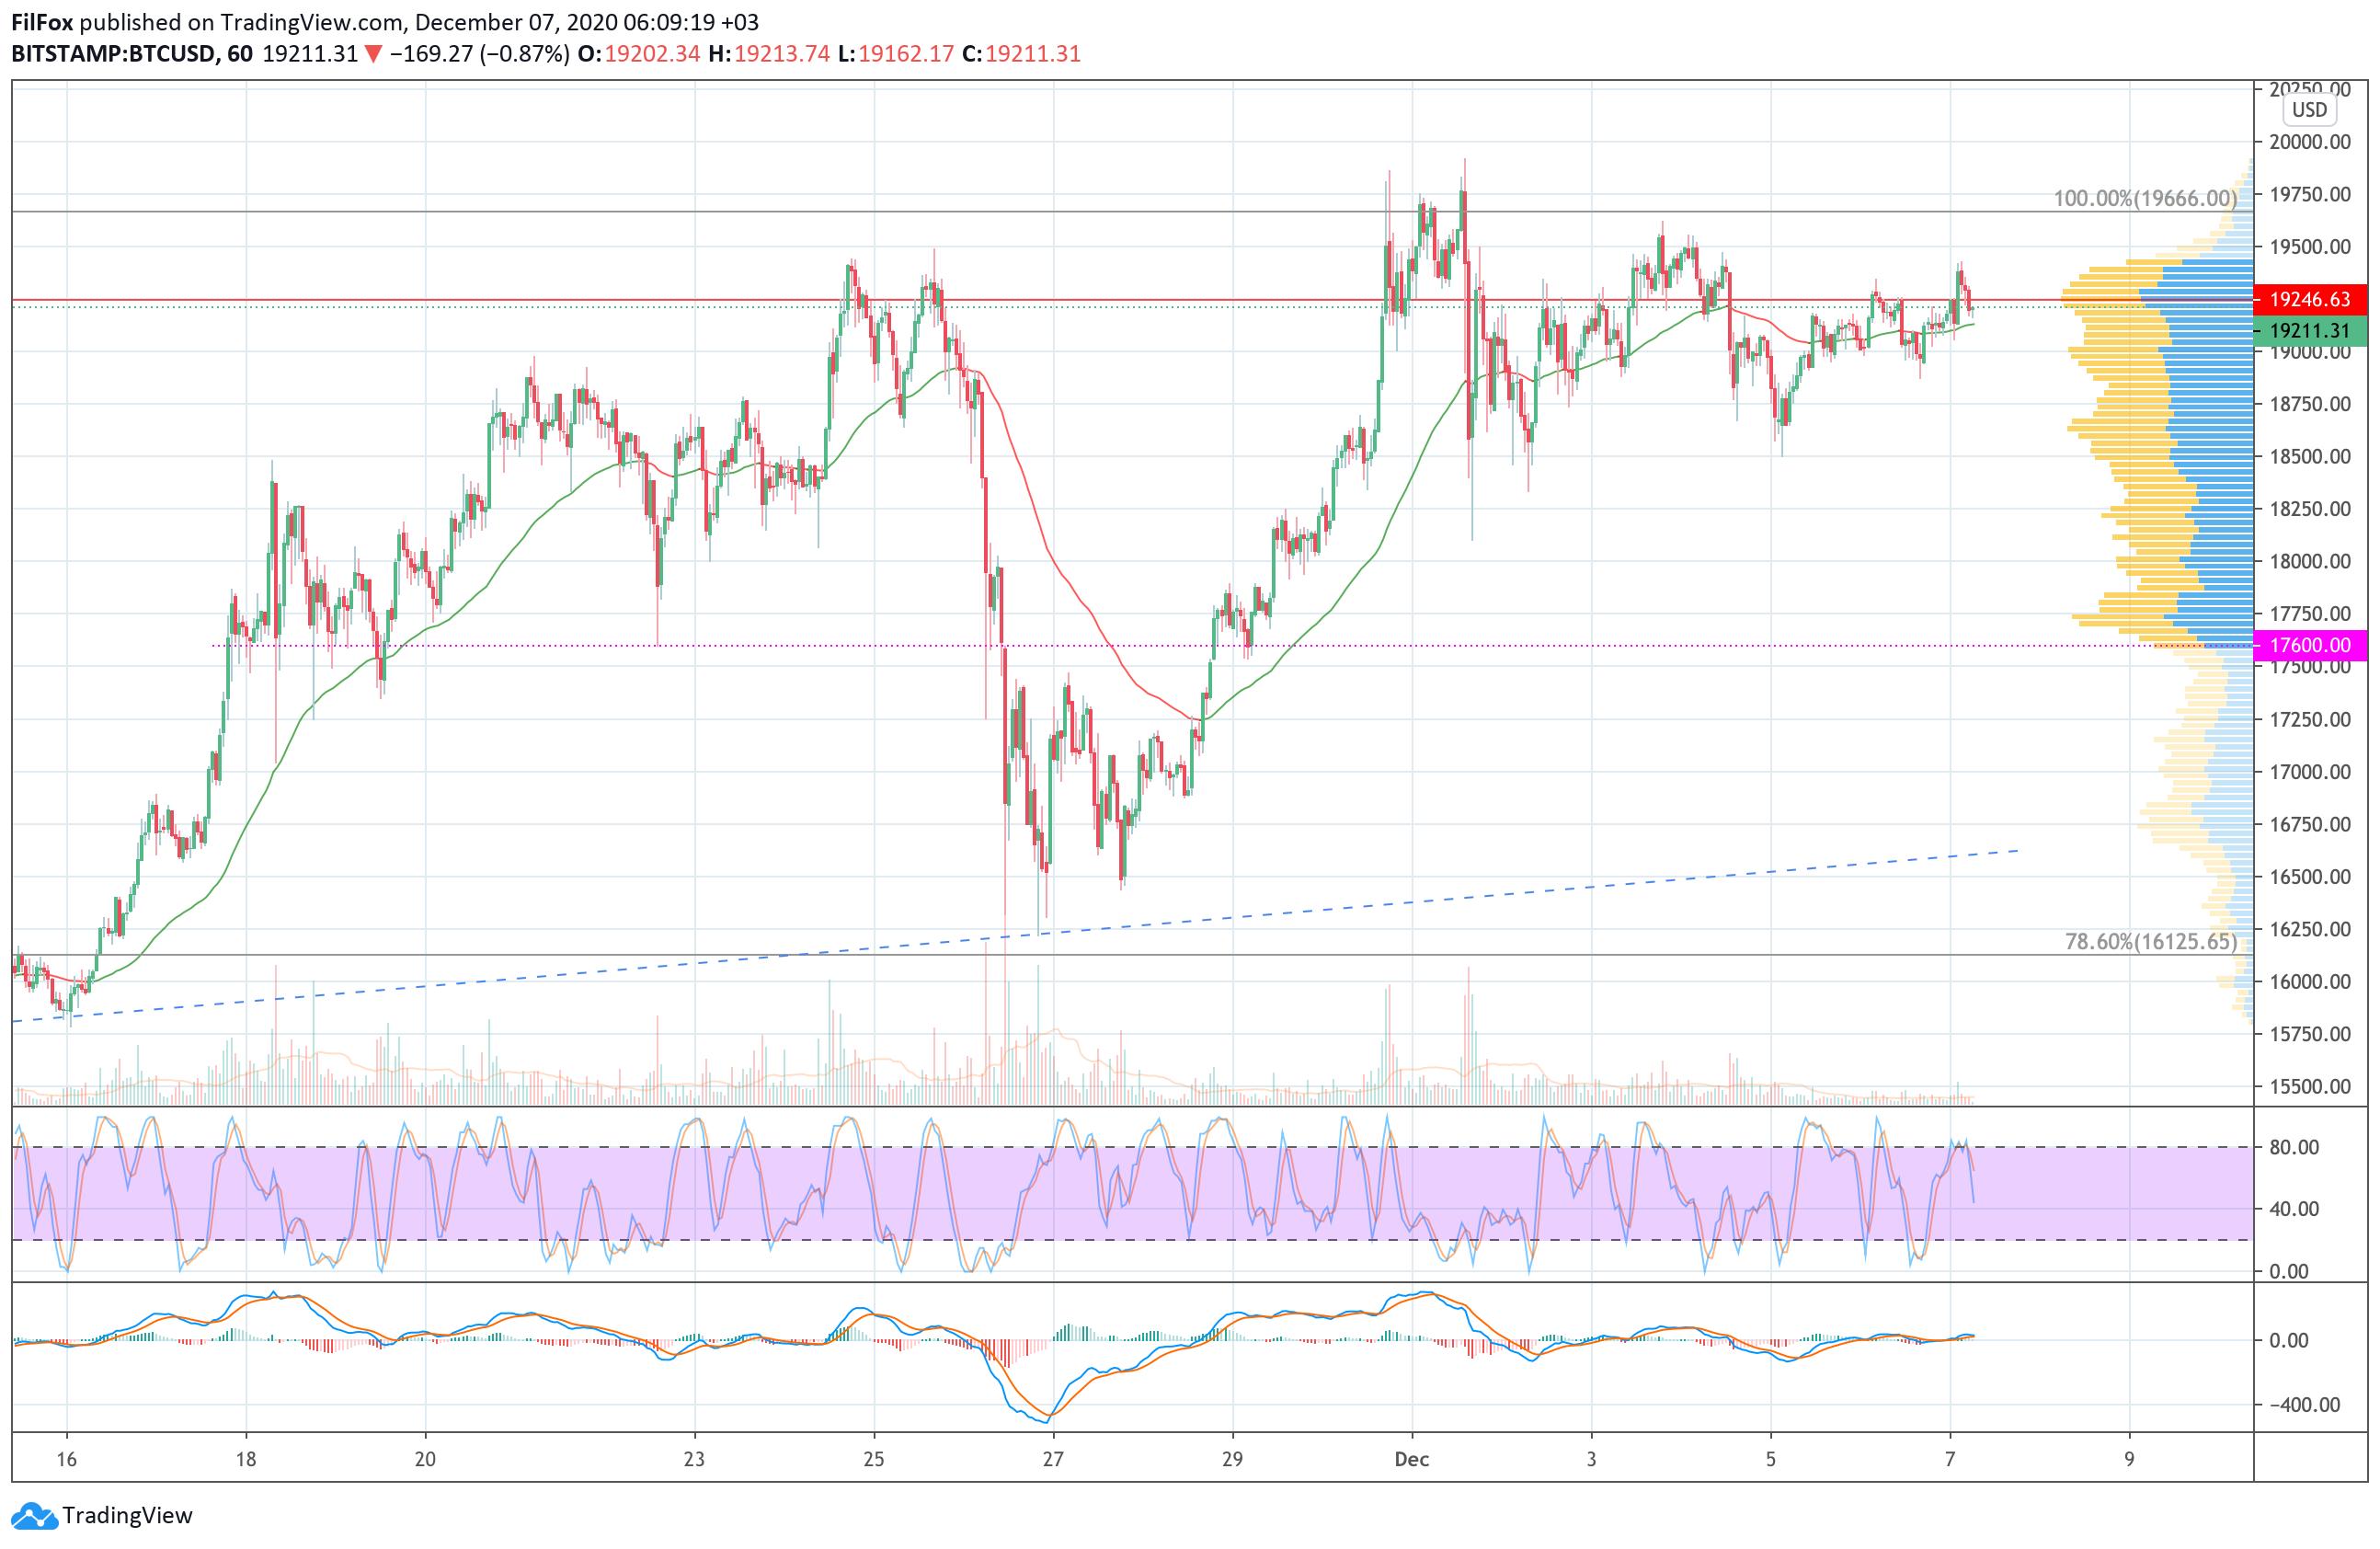 Анализ цен BTC, ETH, XRP (07.12.20)